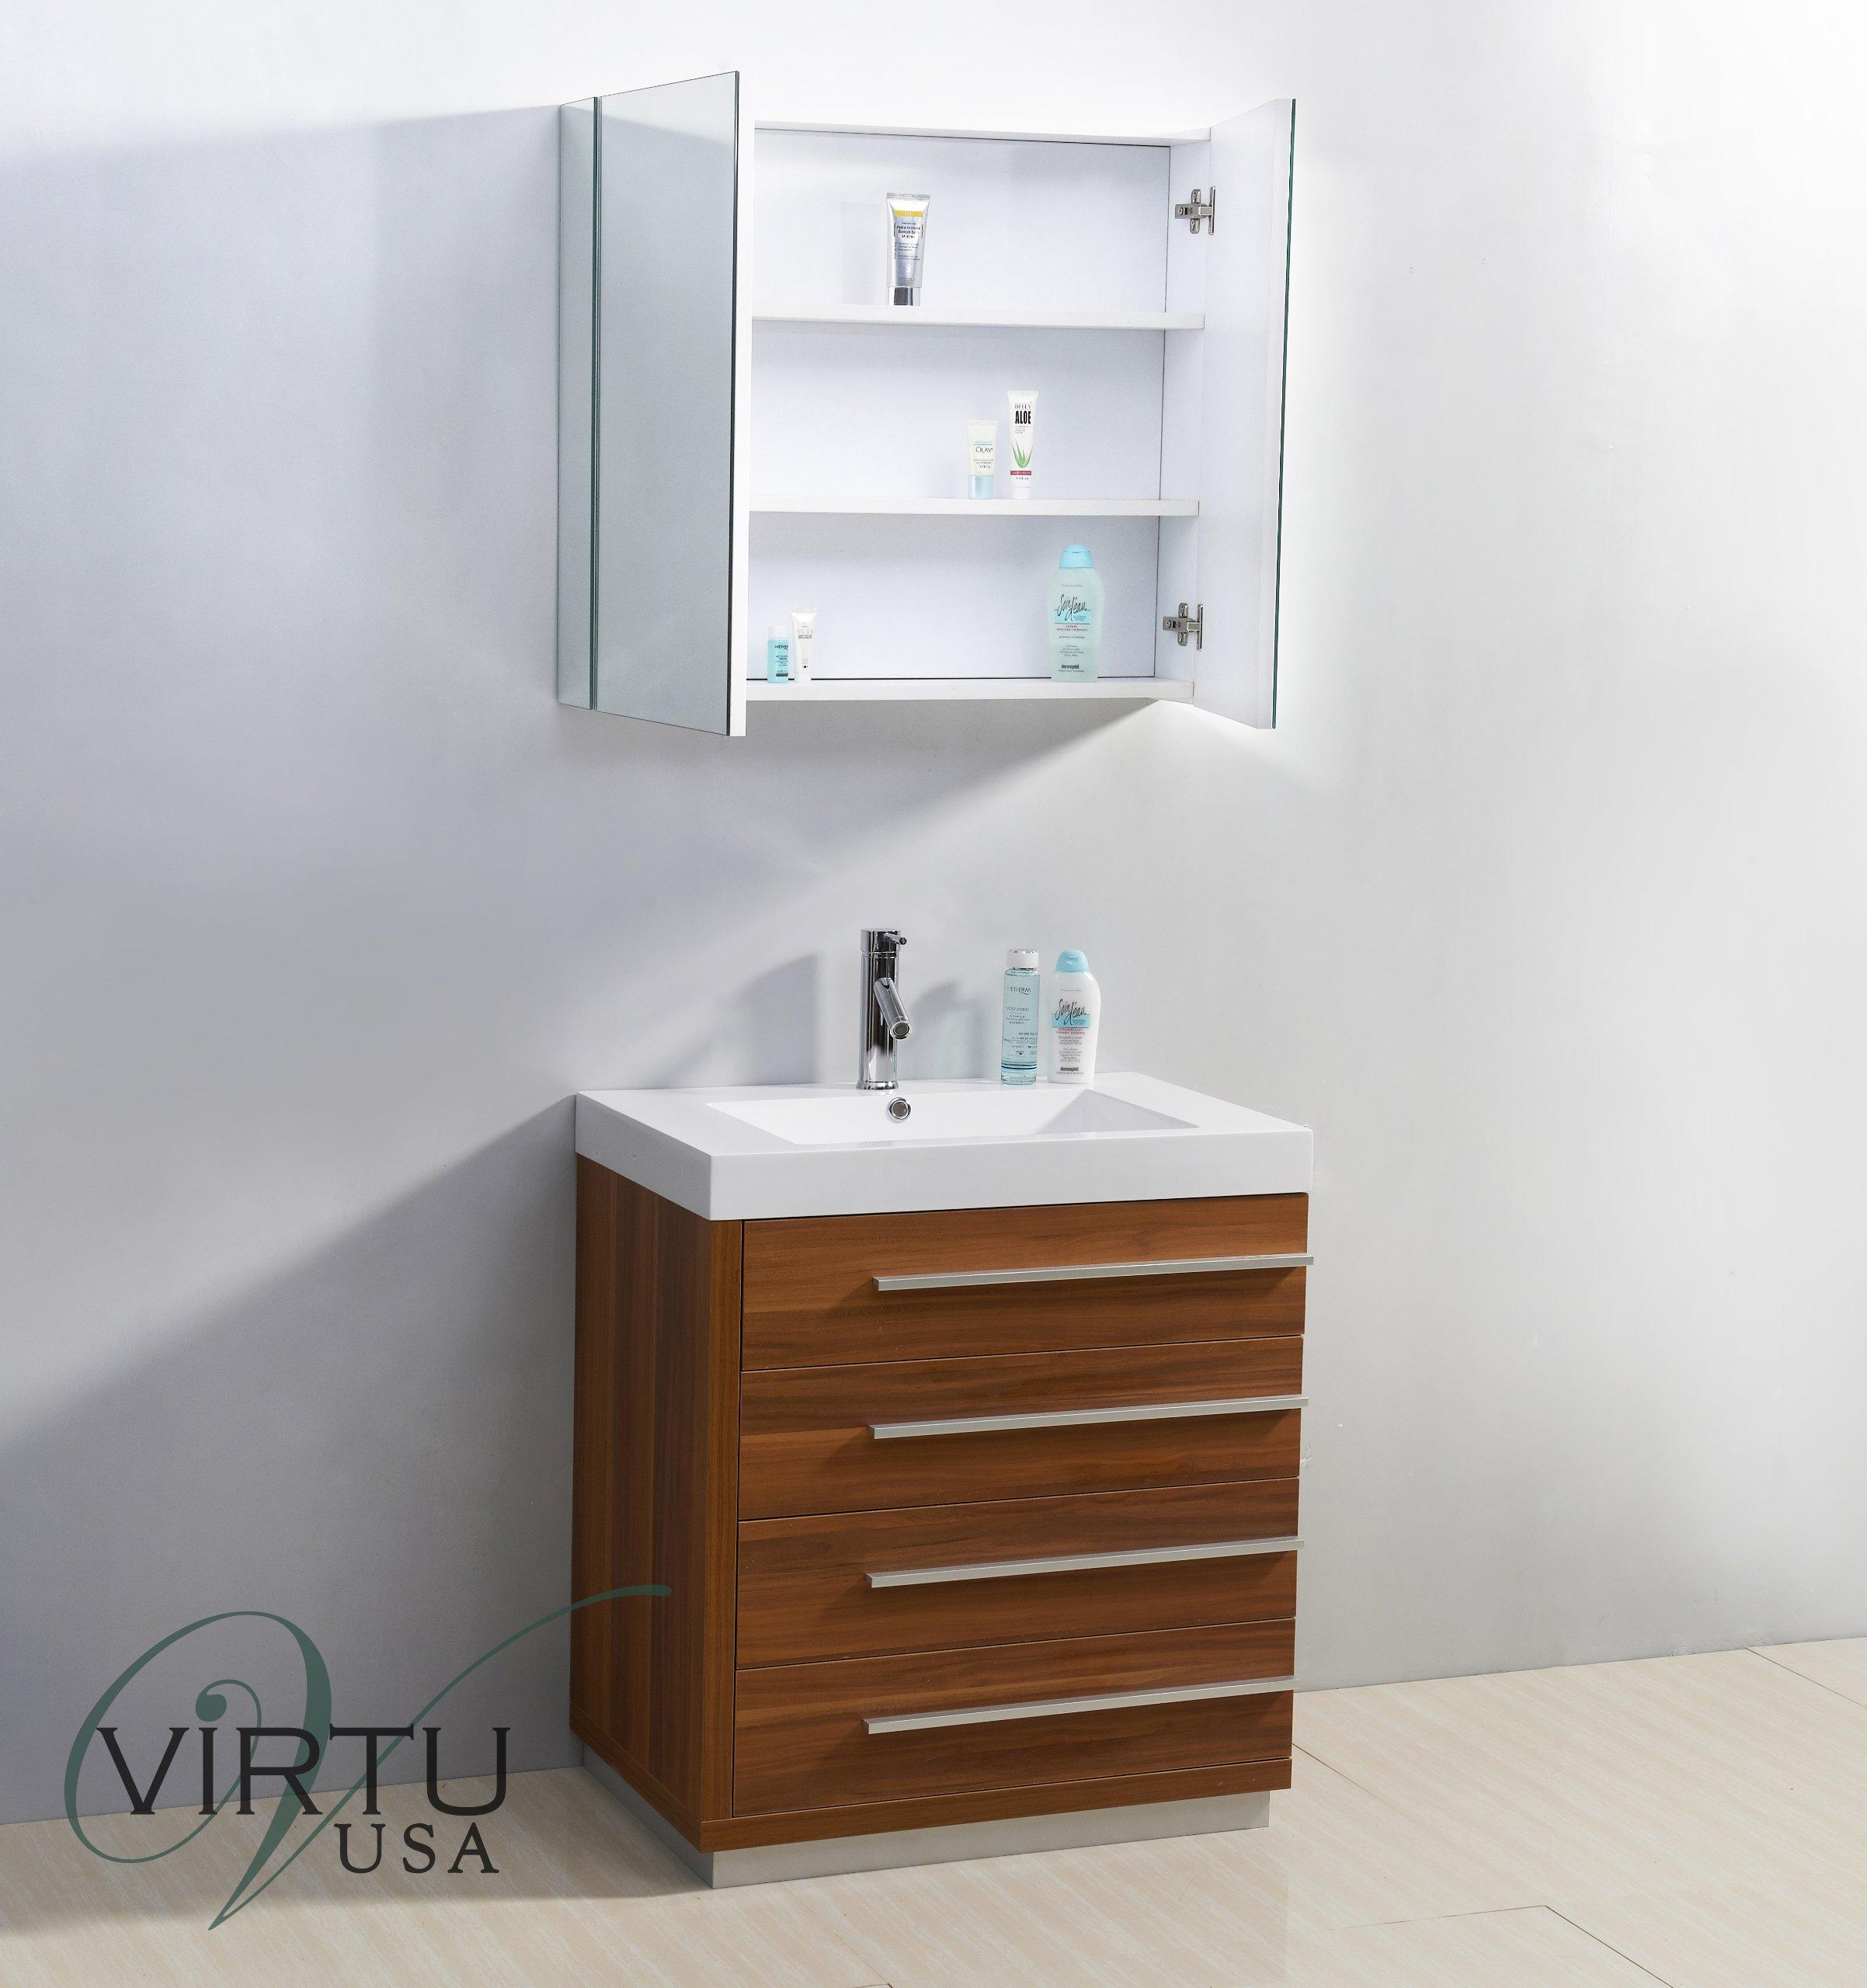 Virtu USA JS-50530-PL 30-Inch Bailey Single Sink Bathroom Vanity, Plum